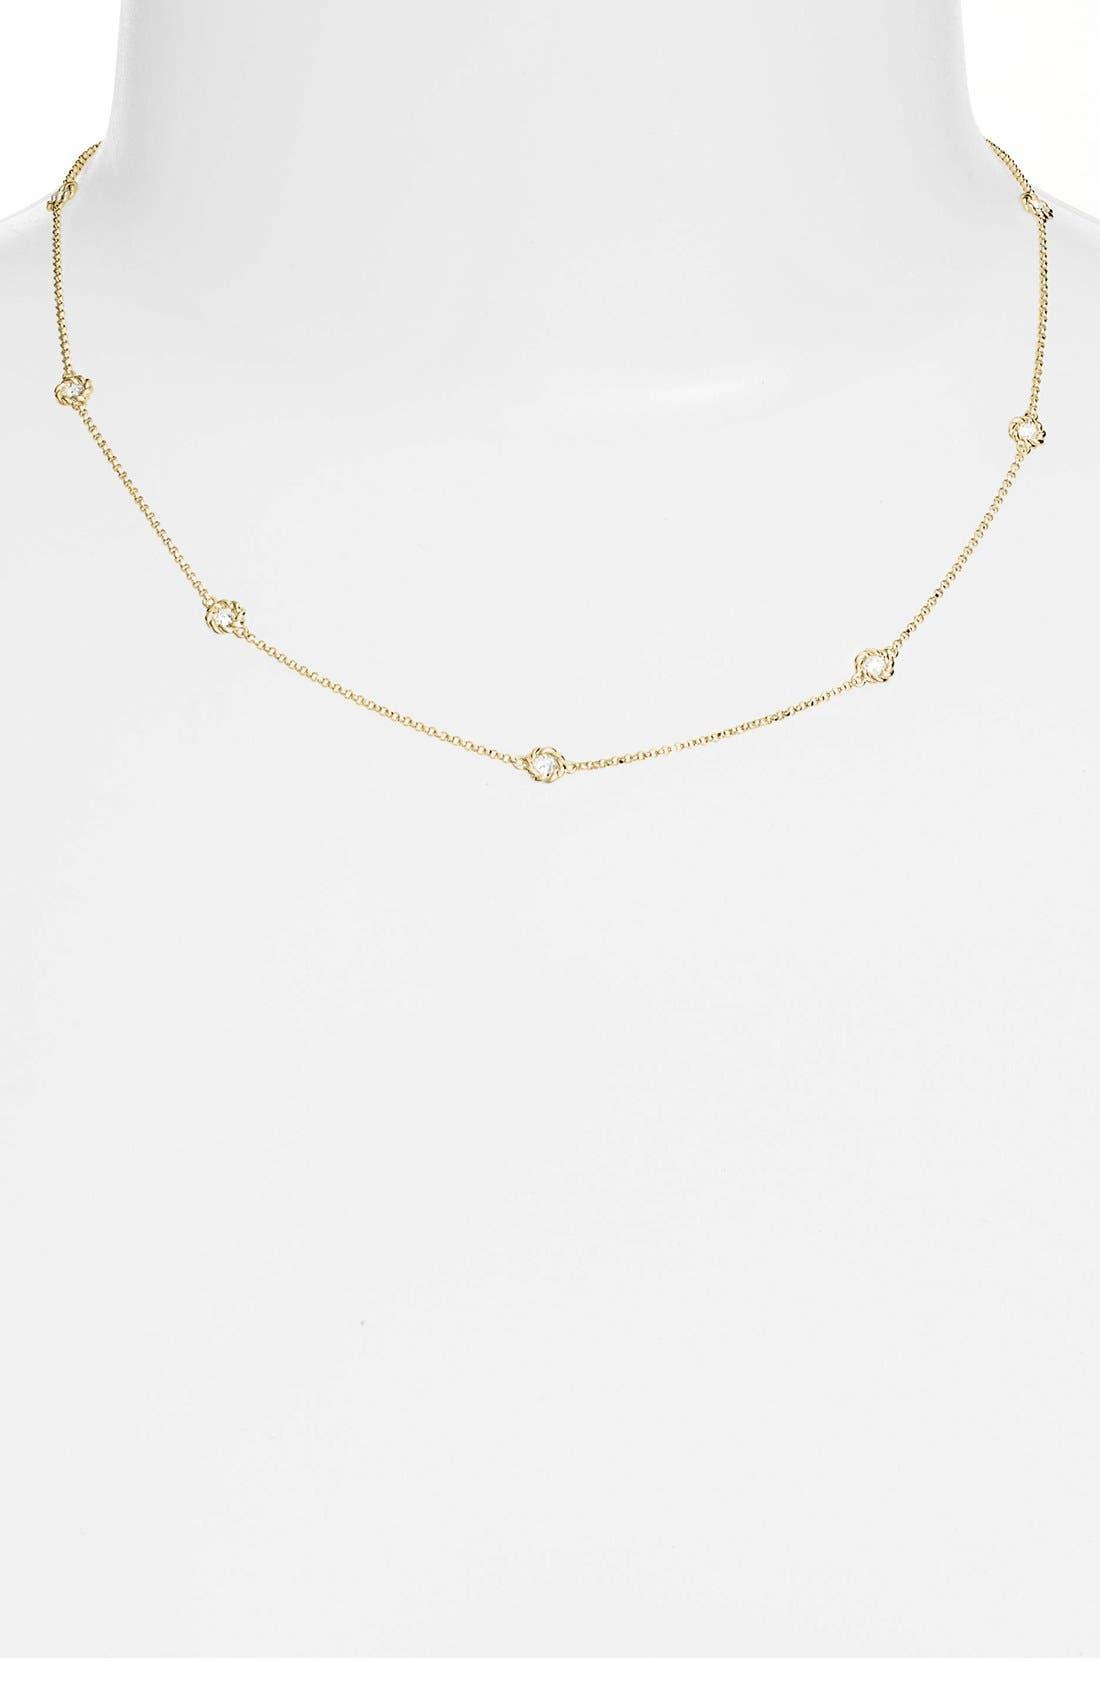 Main Image - Roberto Coin Diamond Station Necklace